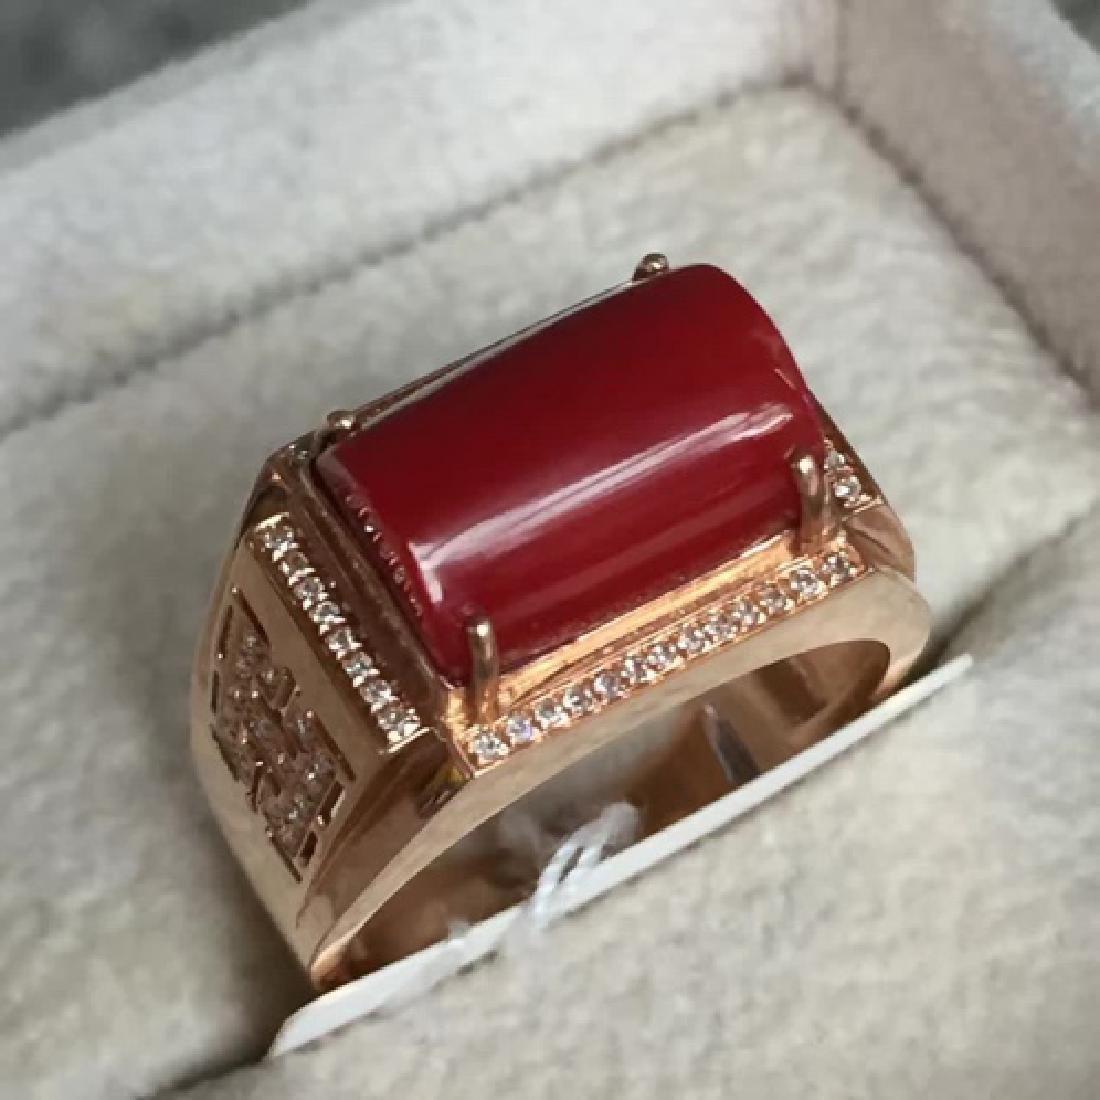 18K AKA MALE RING WITH DIAMOND - 2